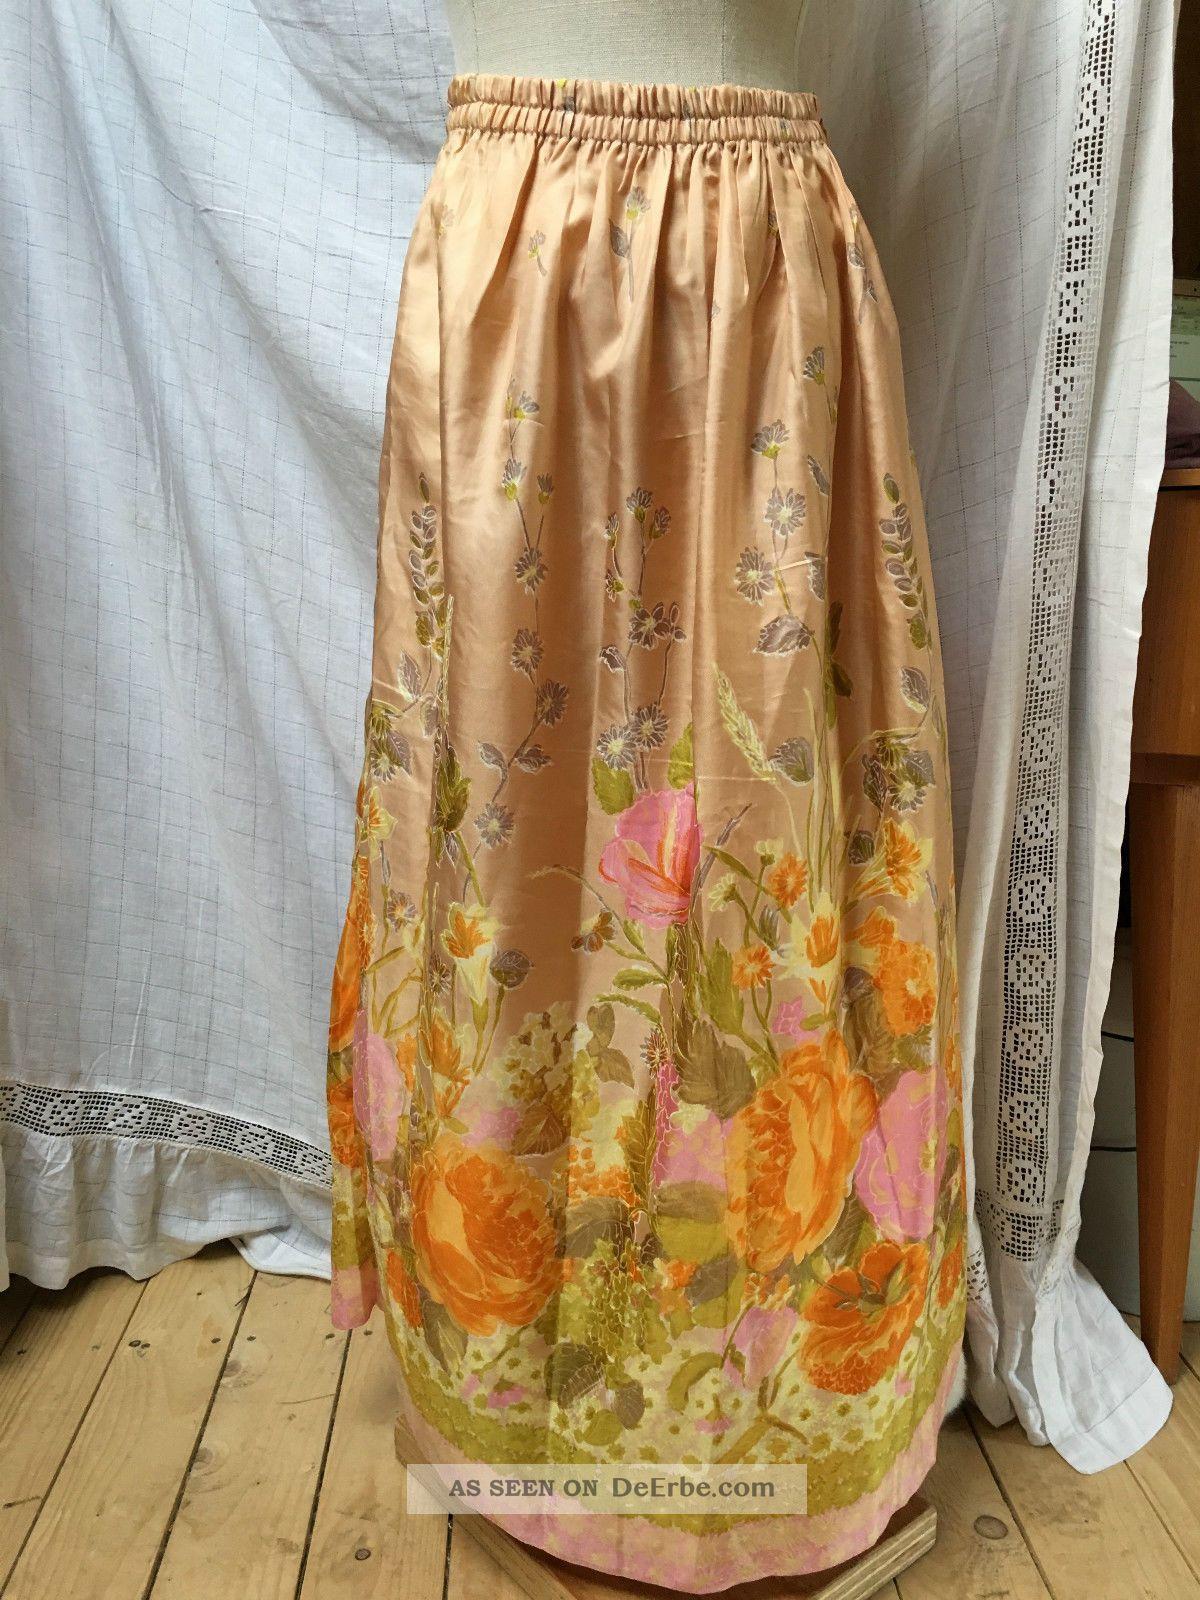 70er Unterrock Sommerrock Rock Blüten Lang S M L Xl Blumen Rosa Apricot Lachs Kleidung Bild